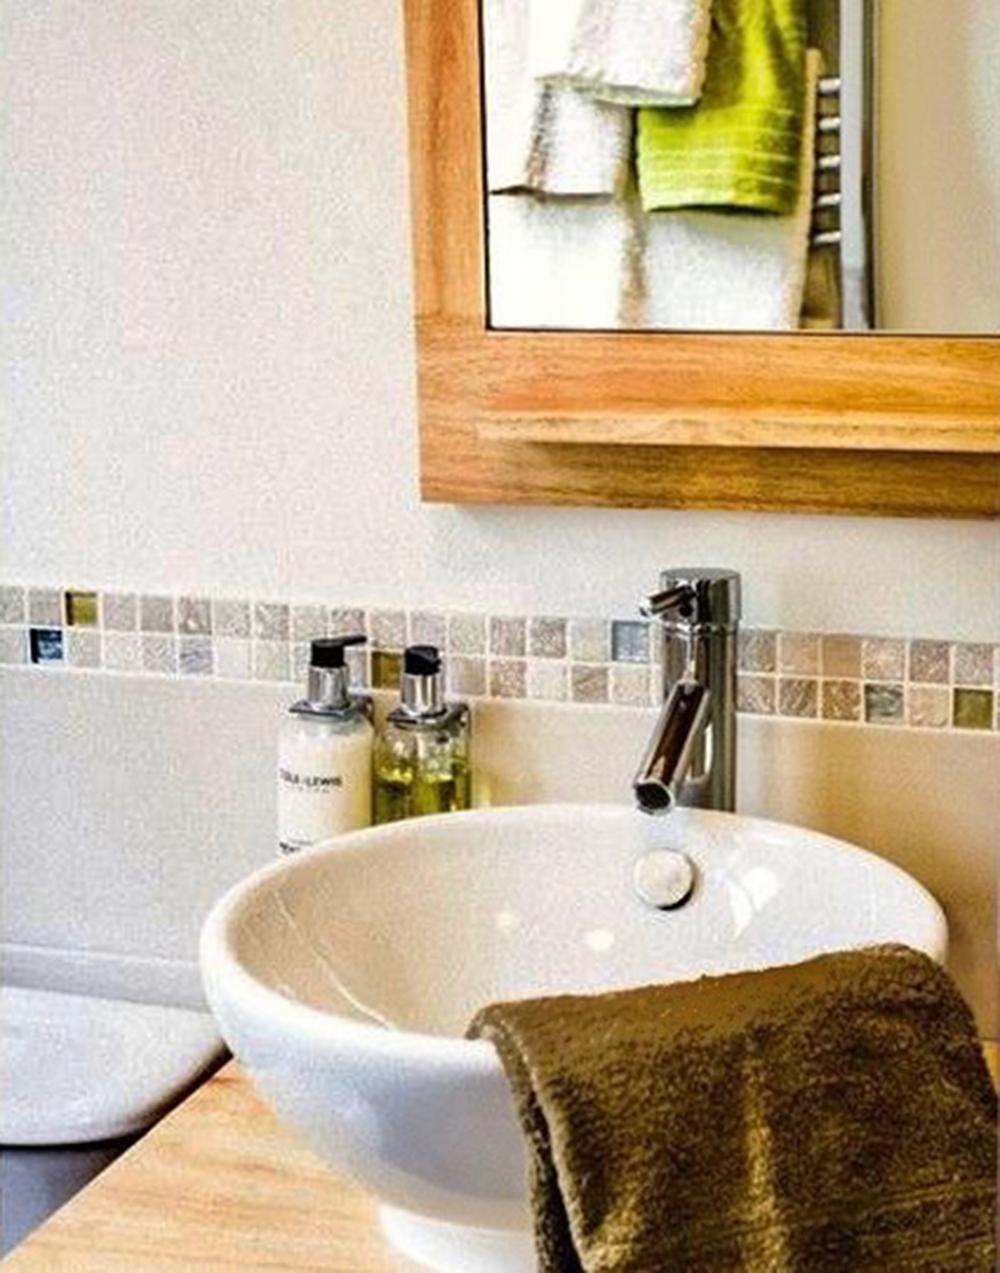 Chalet suite 2 bathroom